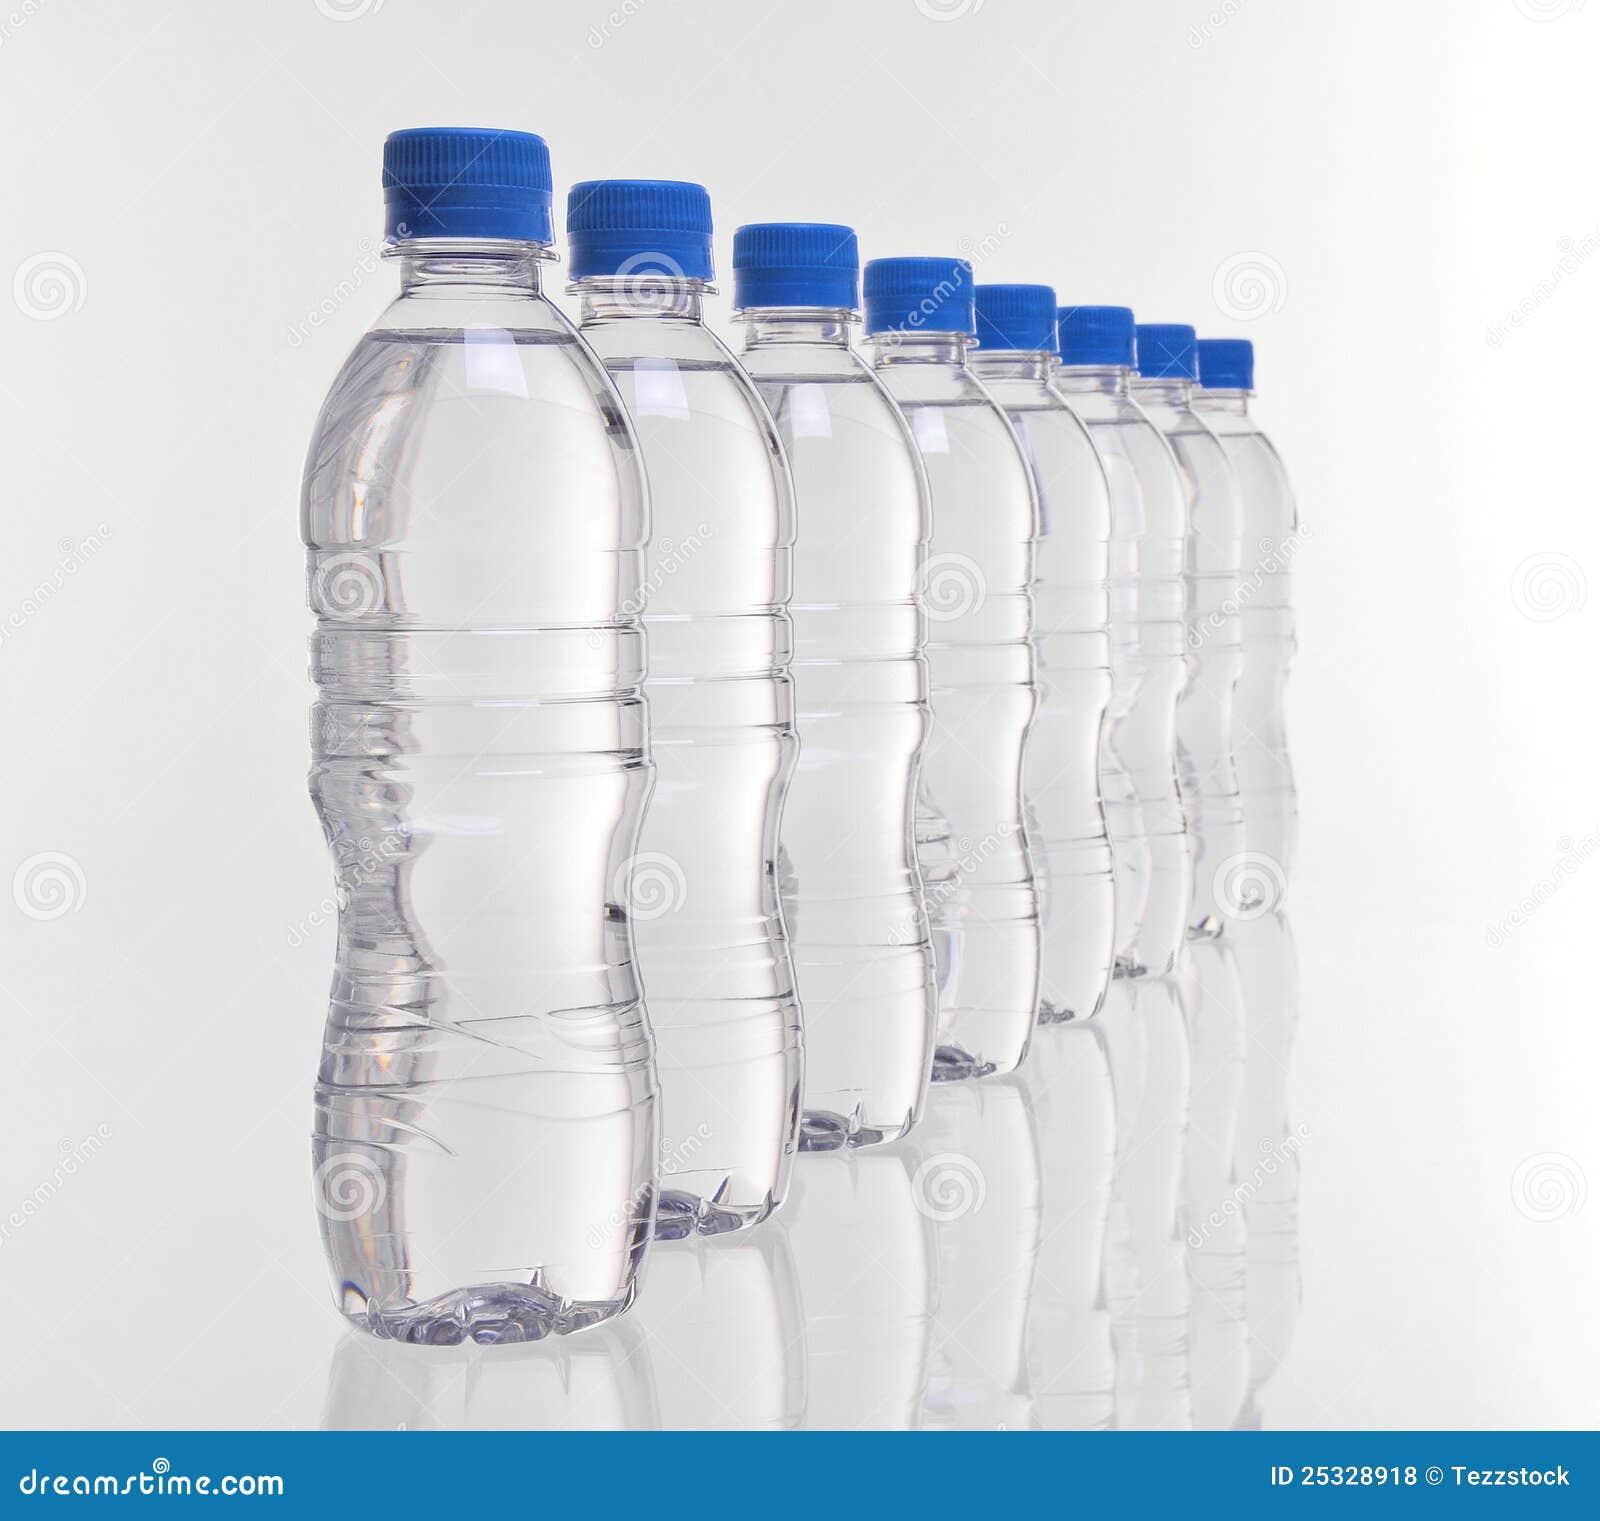 Water Bottles Row Royalty Free Stock Photos Image 25328918